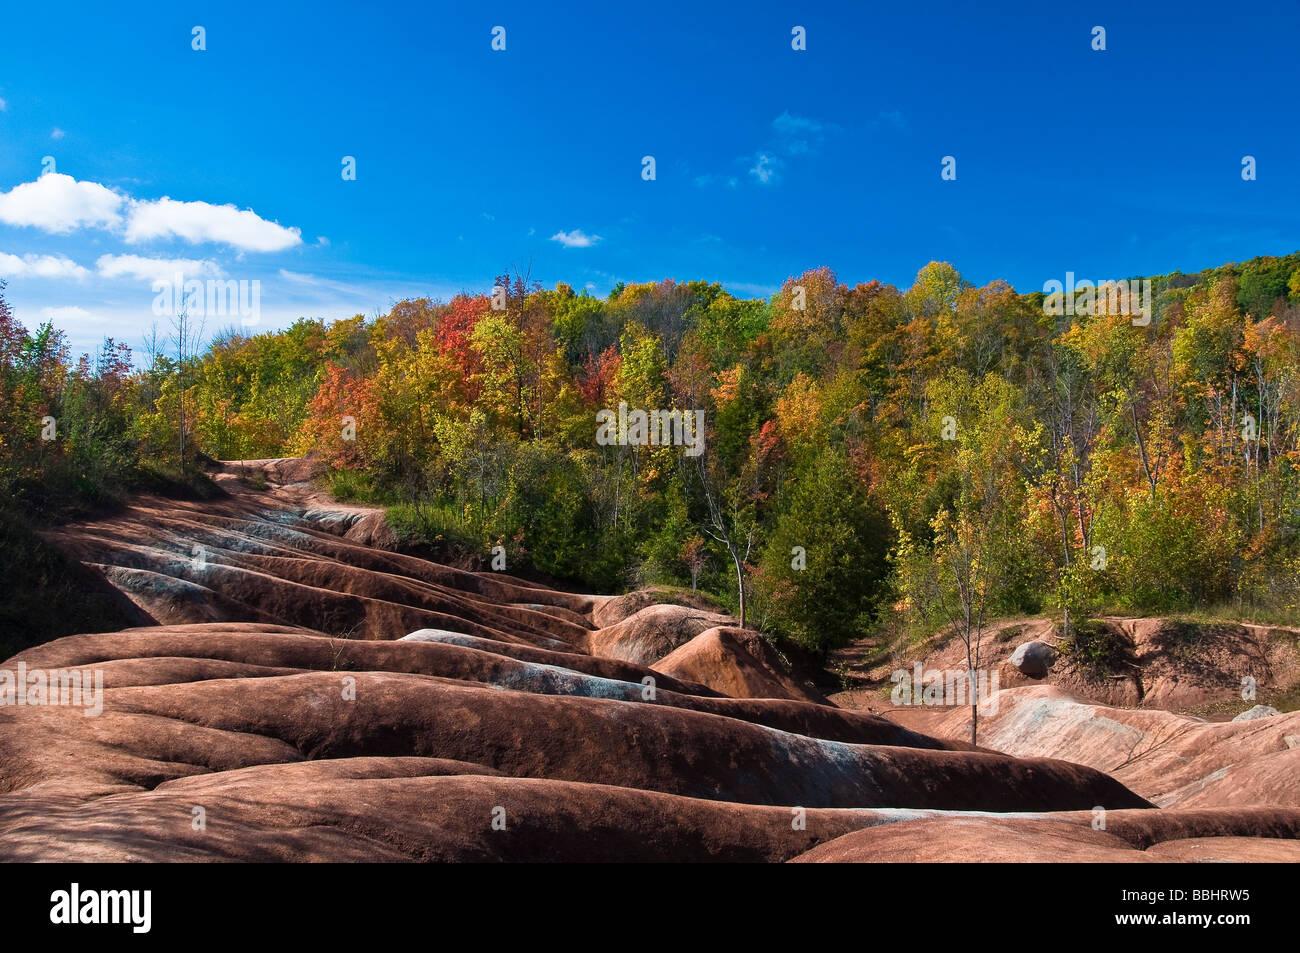 Cheltenham Badlands in Caledon Ontario Canada - Stock Image